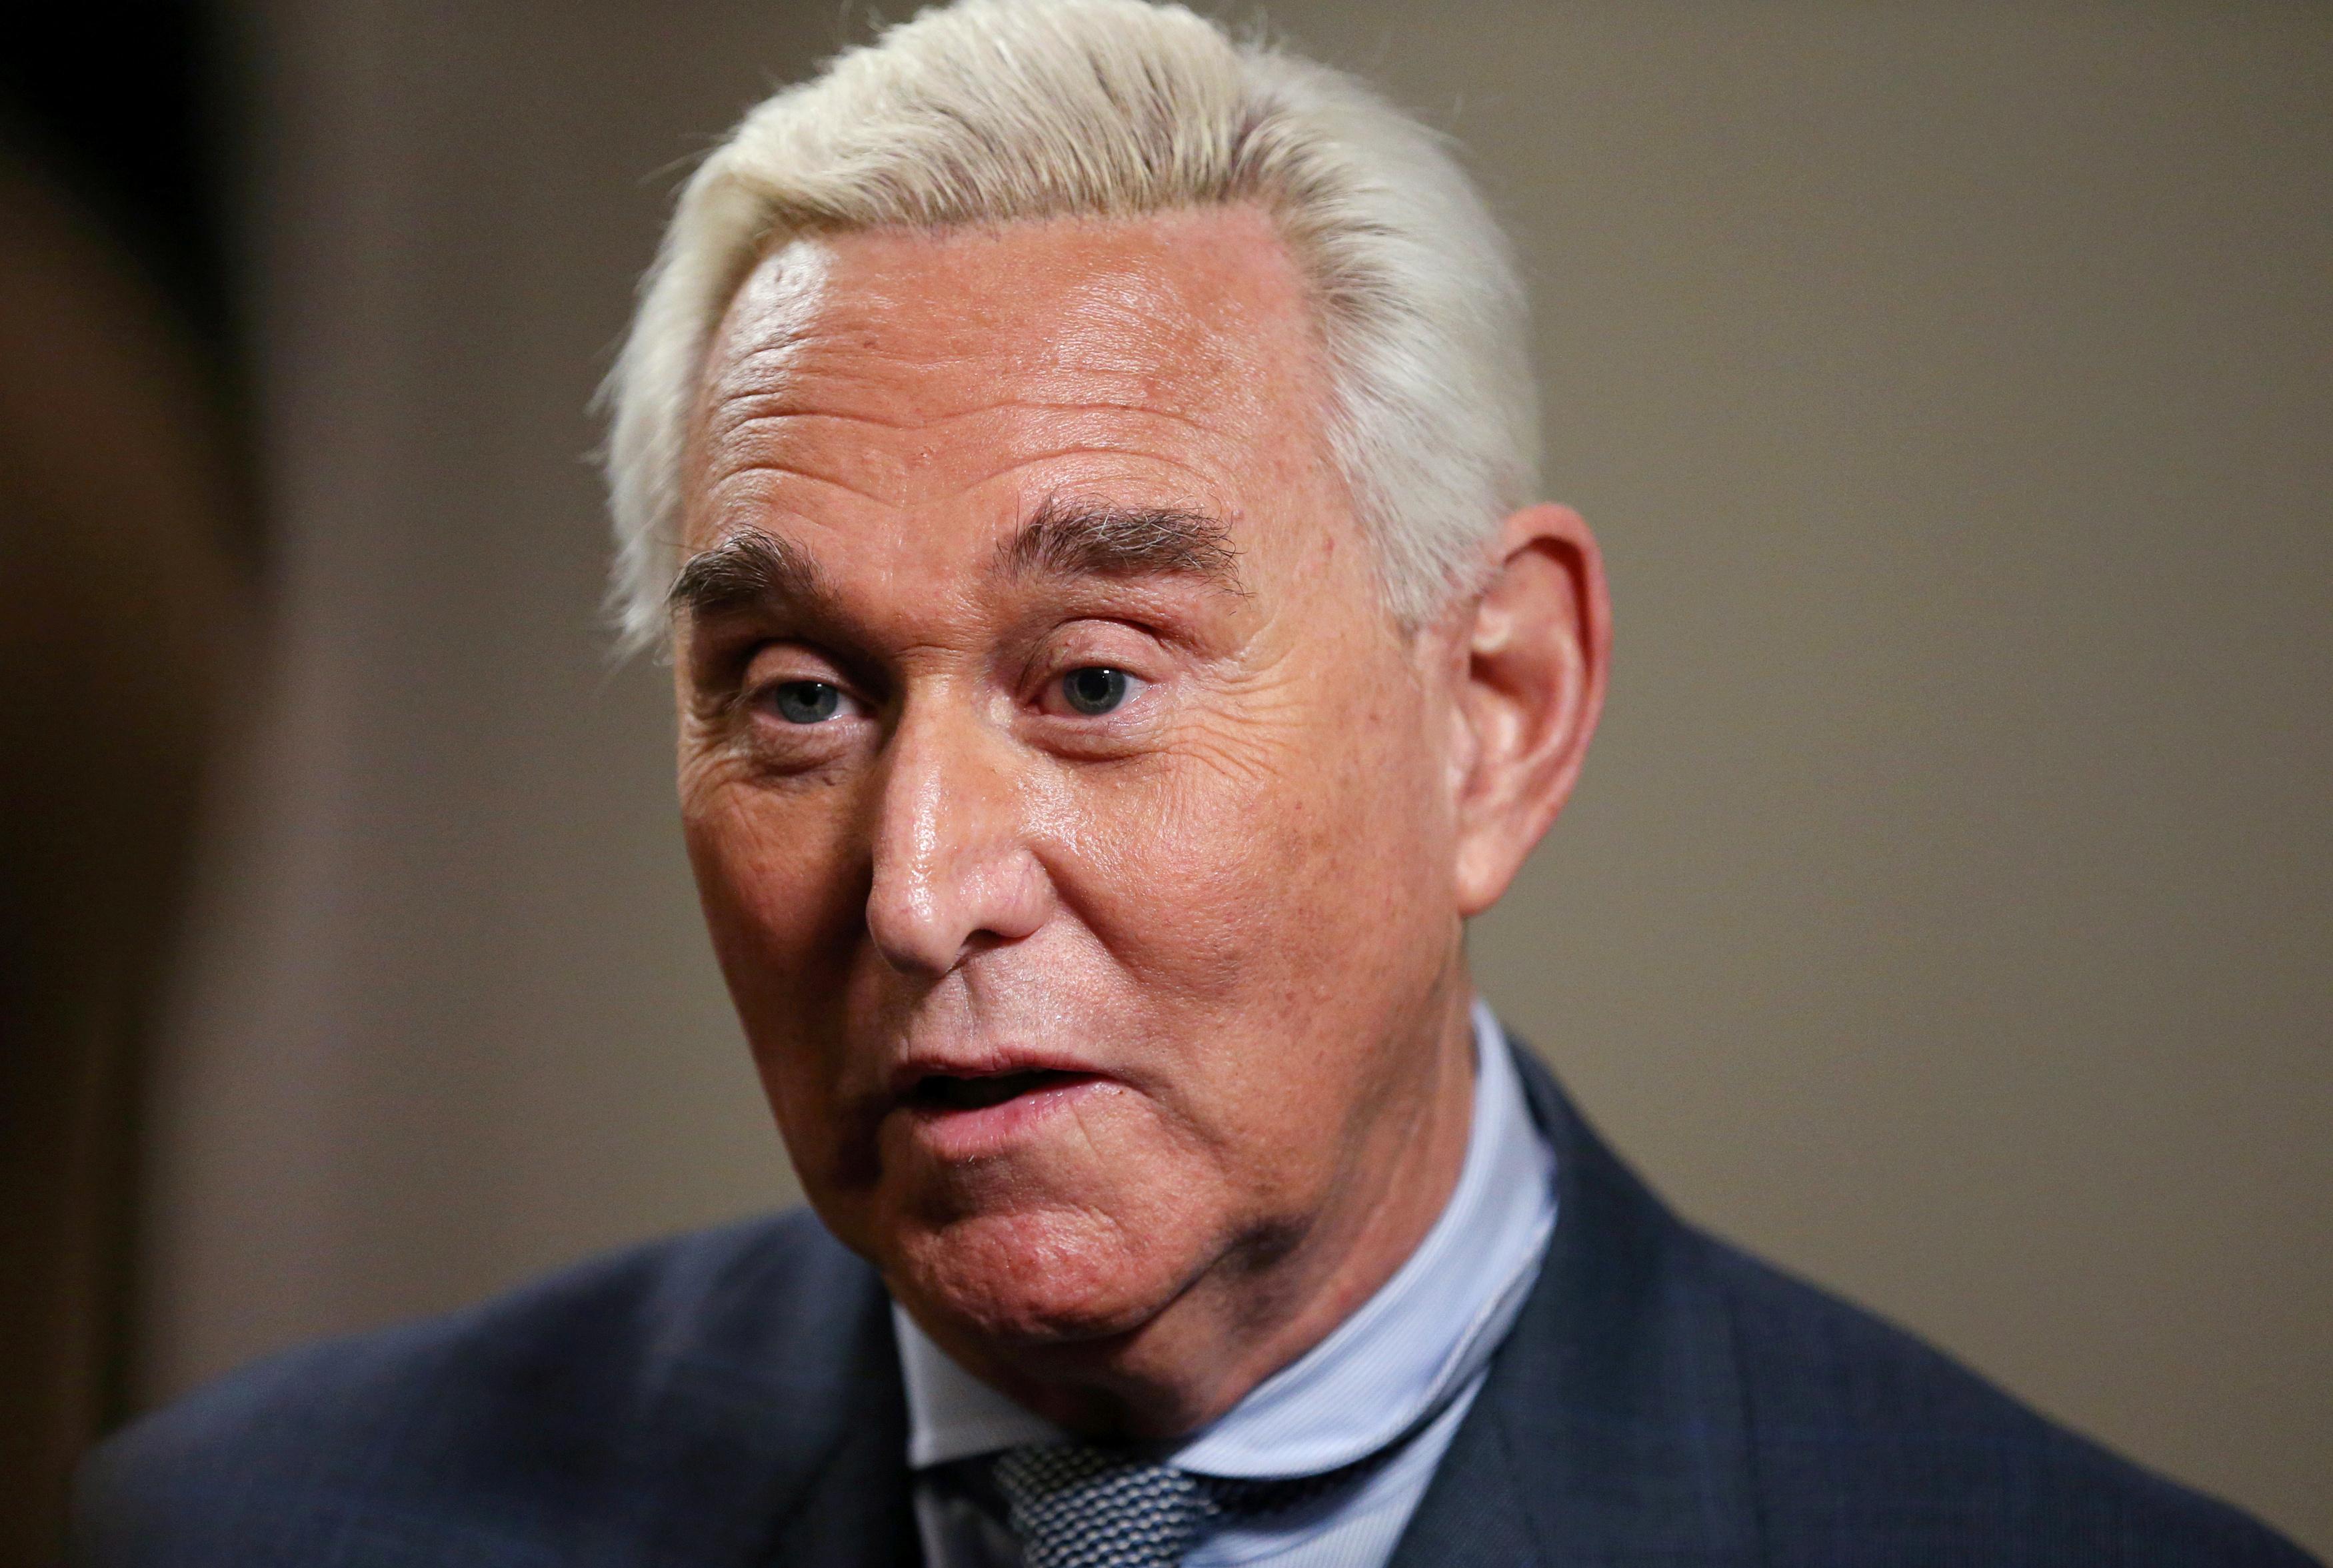 U.S. judge issues gag order in trial of former Trump adviser Stone